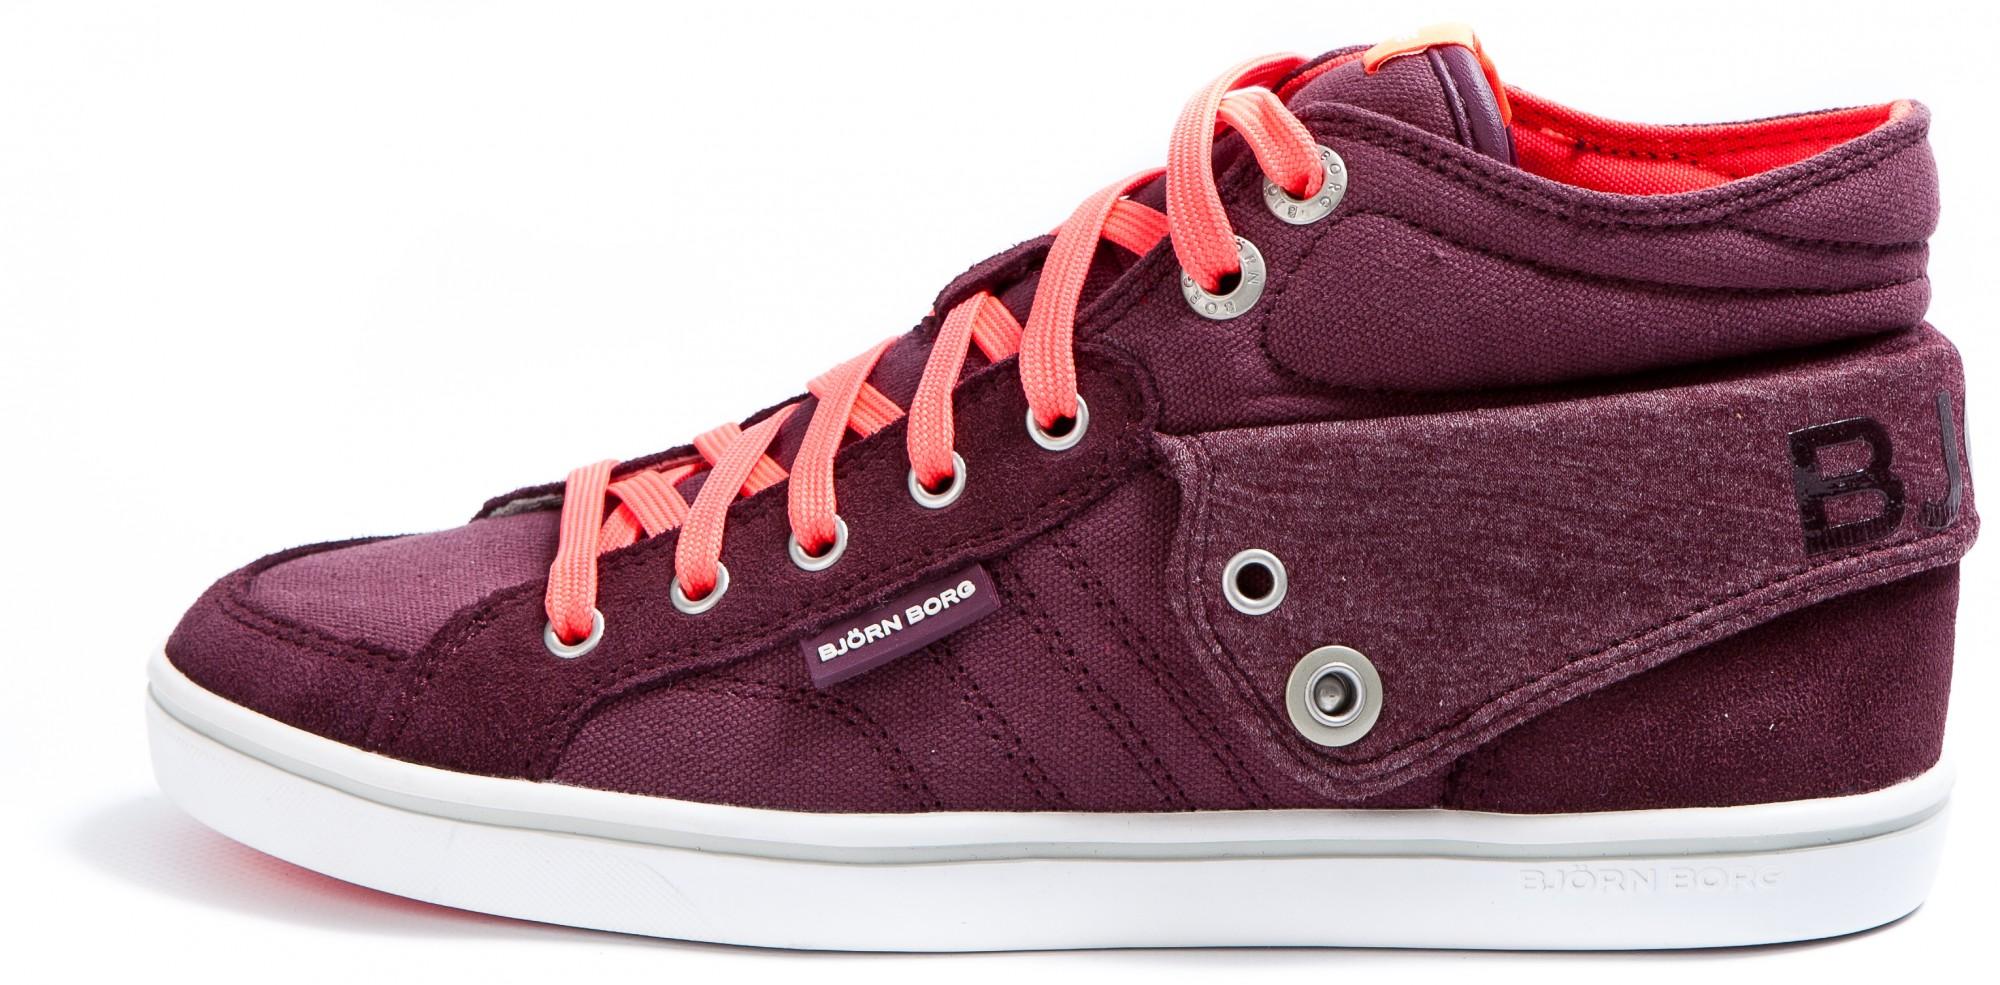 Bjoern-Borg-Schuhe-retro-Damen-Sneakers-Lloyd-Sommersneakers-Damenschuhe